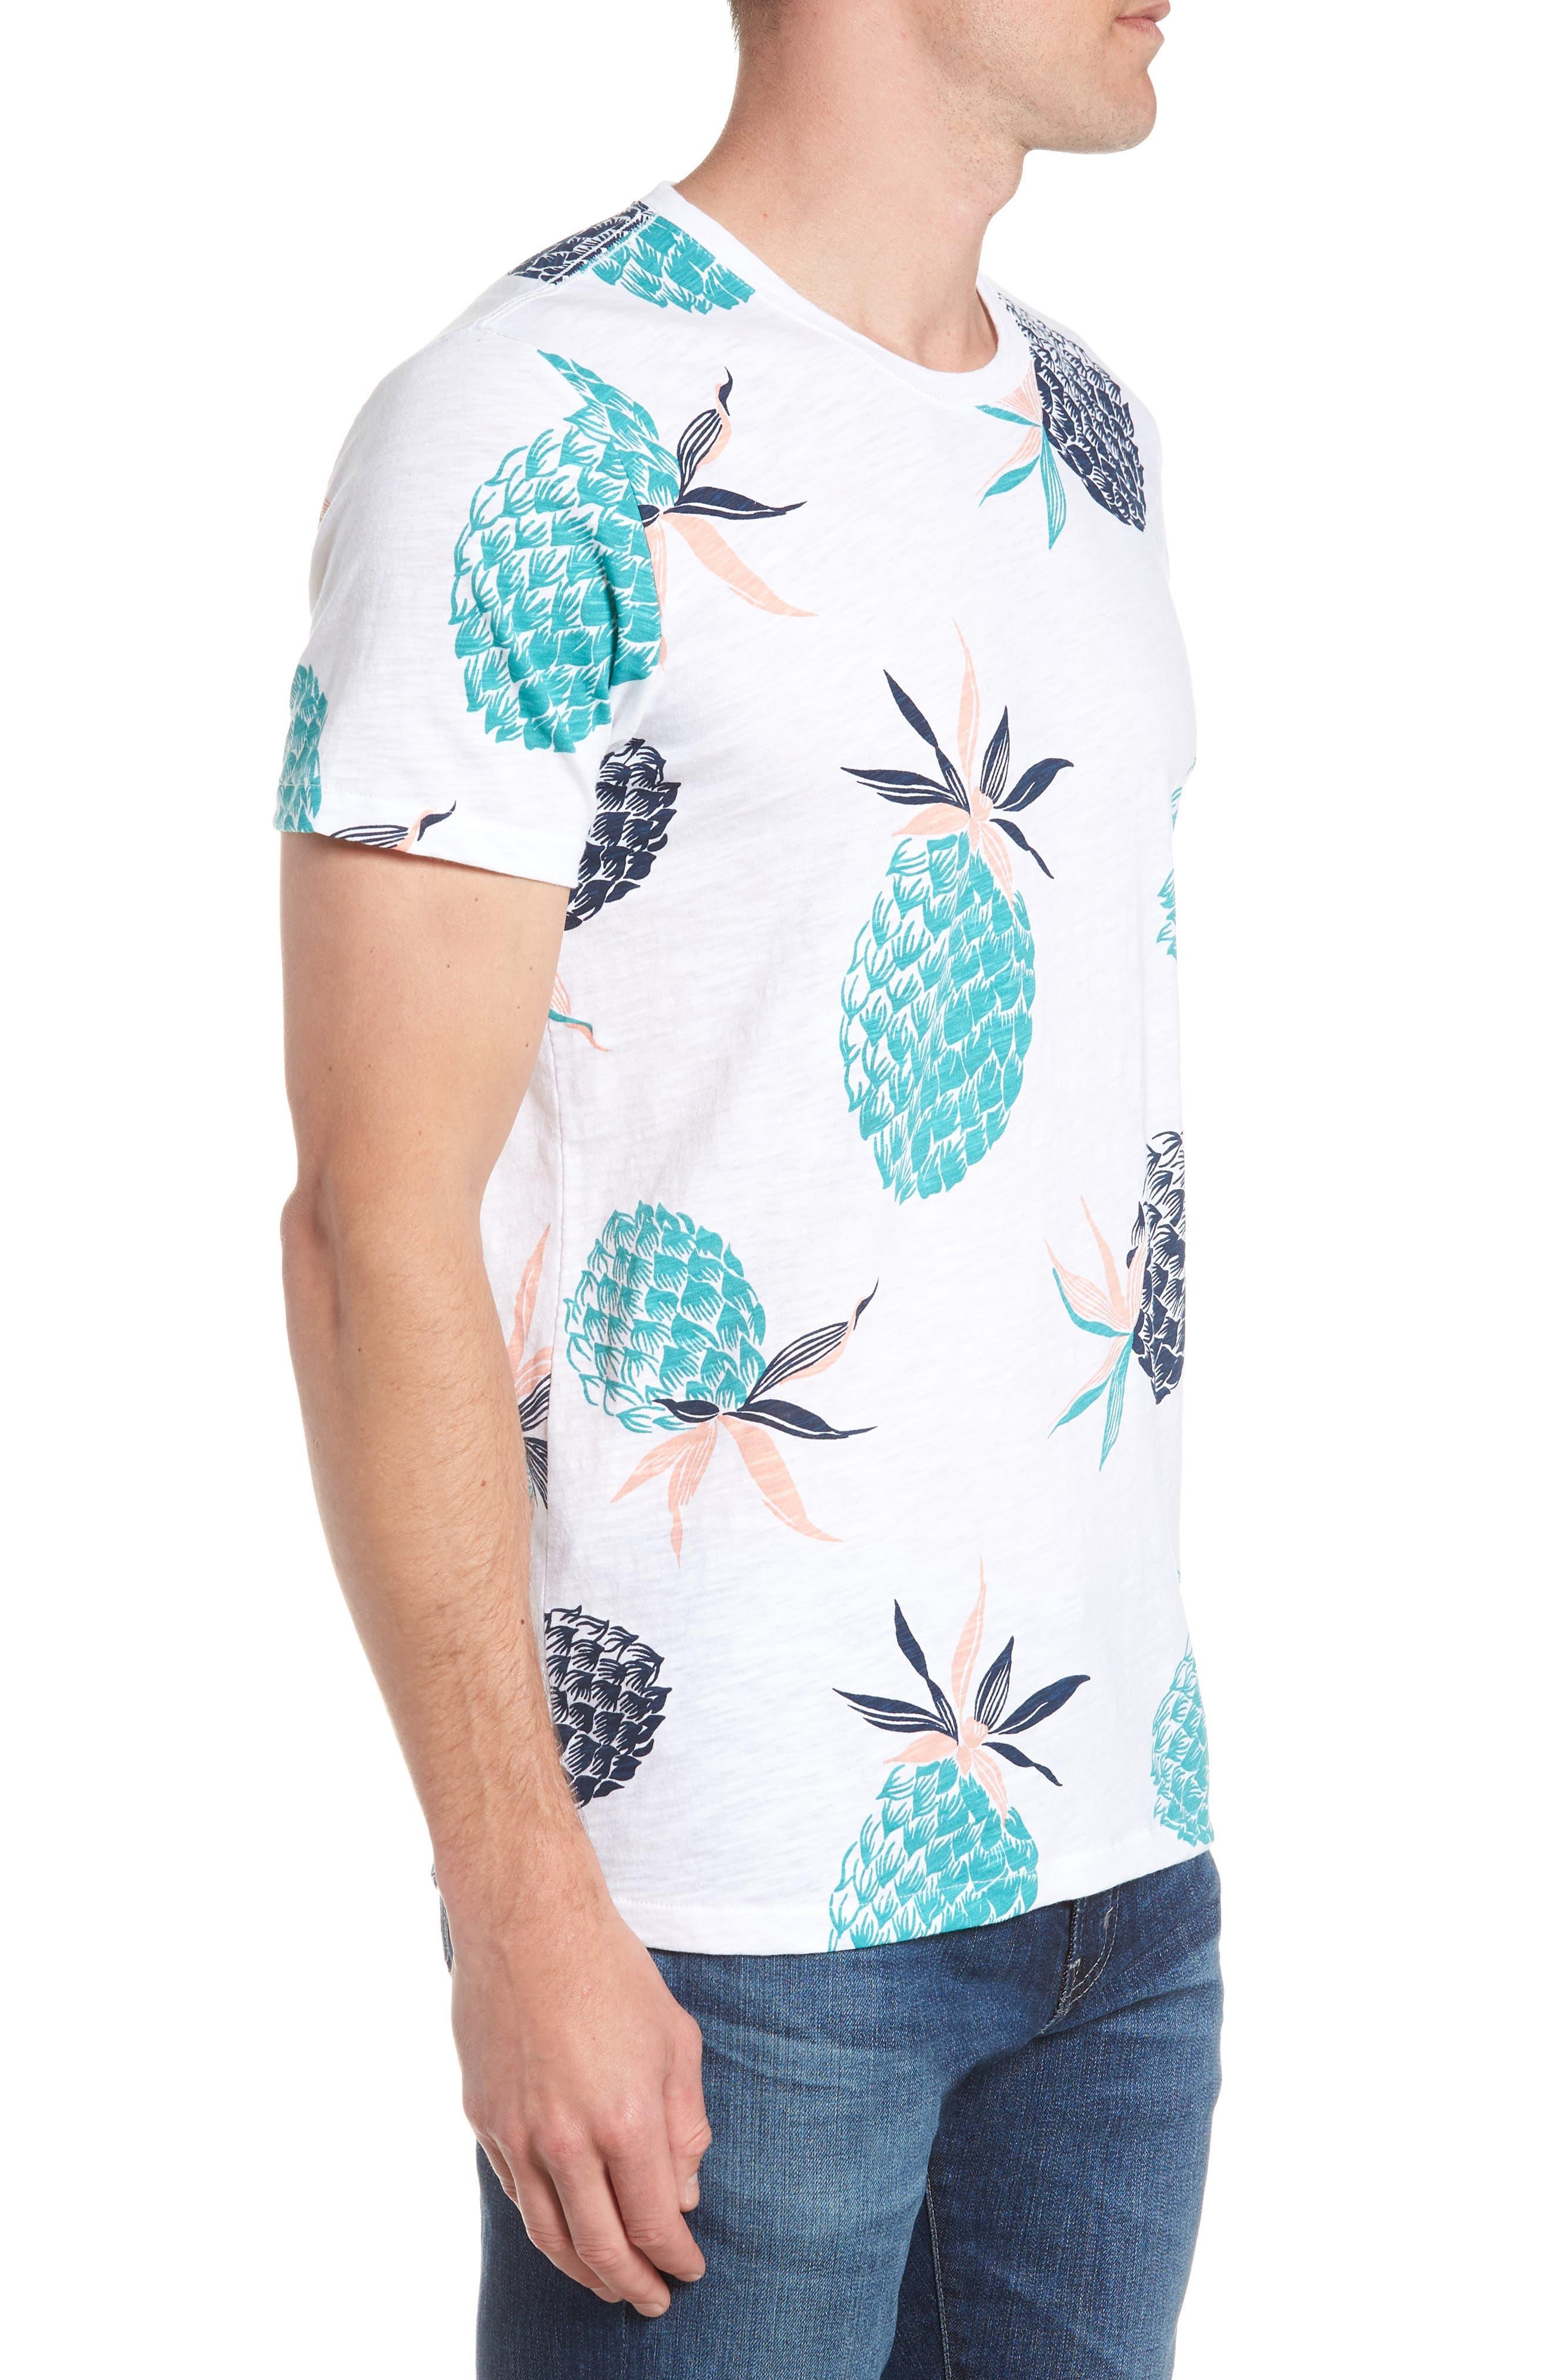 Pineapple Party Slim Fit T-Shirt,                             Alternate thumbnail 3, color,                             White/ Latigo Bay/ Sorbet